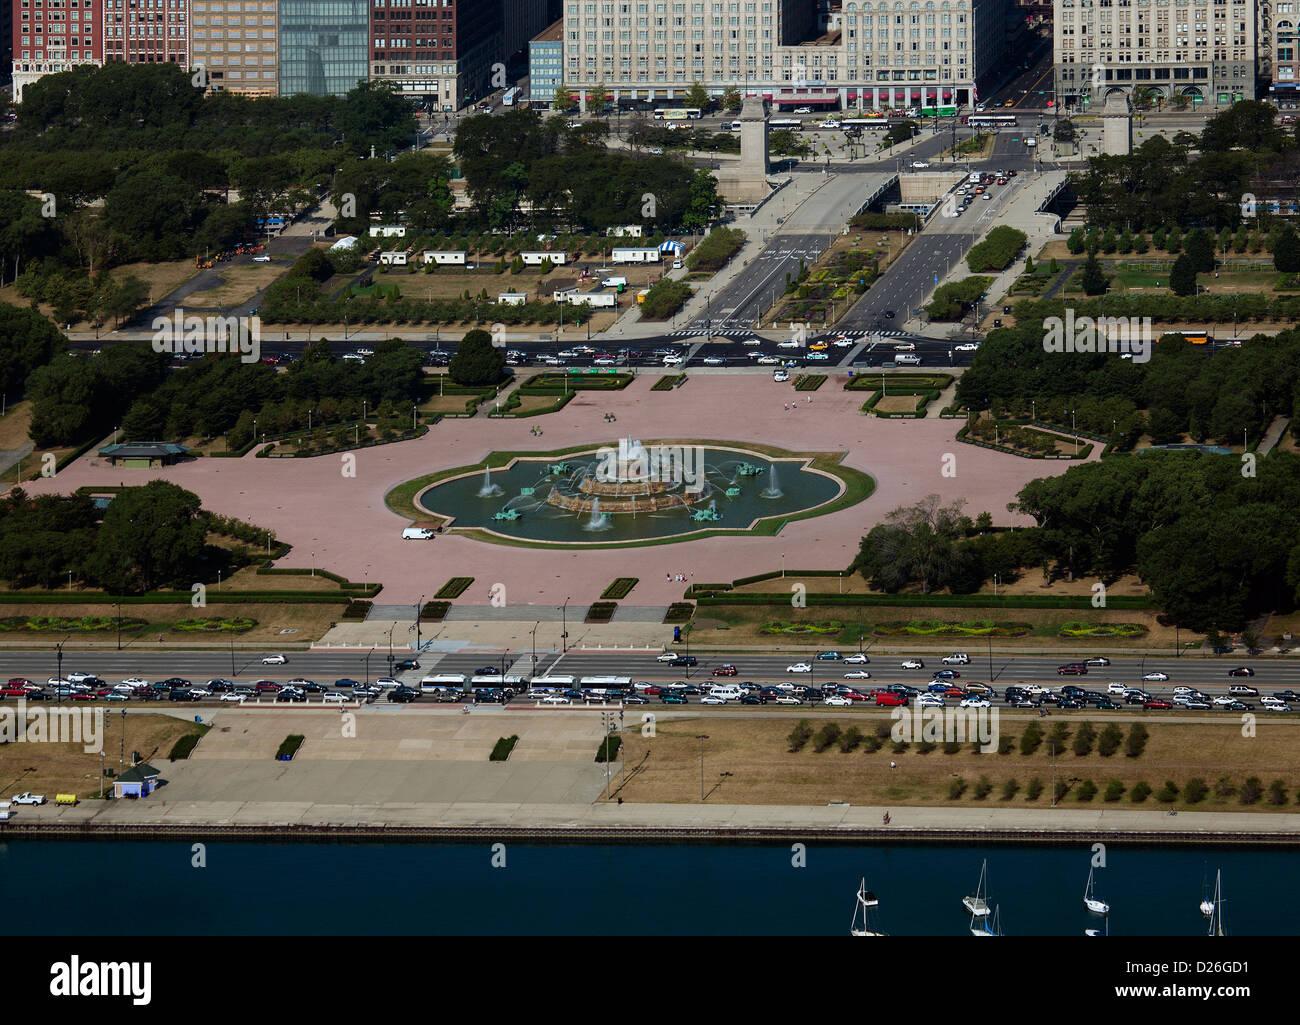 aerial photograph Buckingham Fountain, Grant Park, Chicago, Illinois - Stock Image